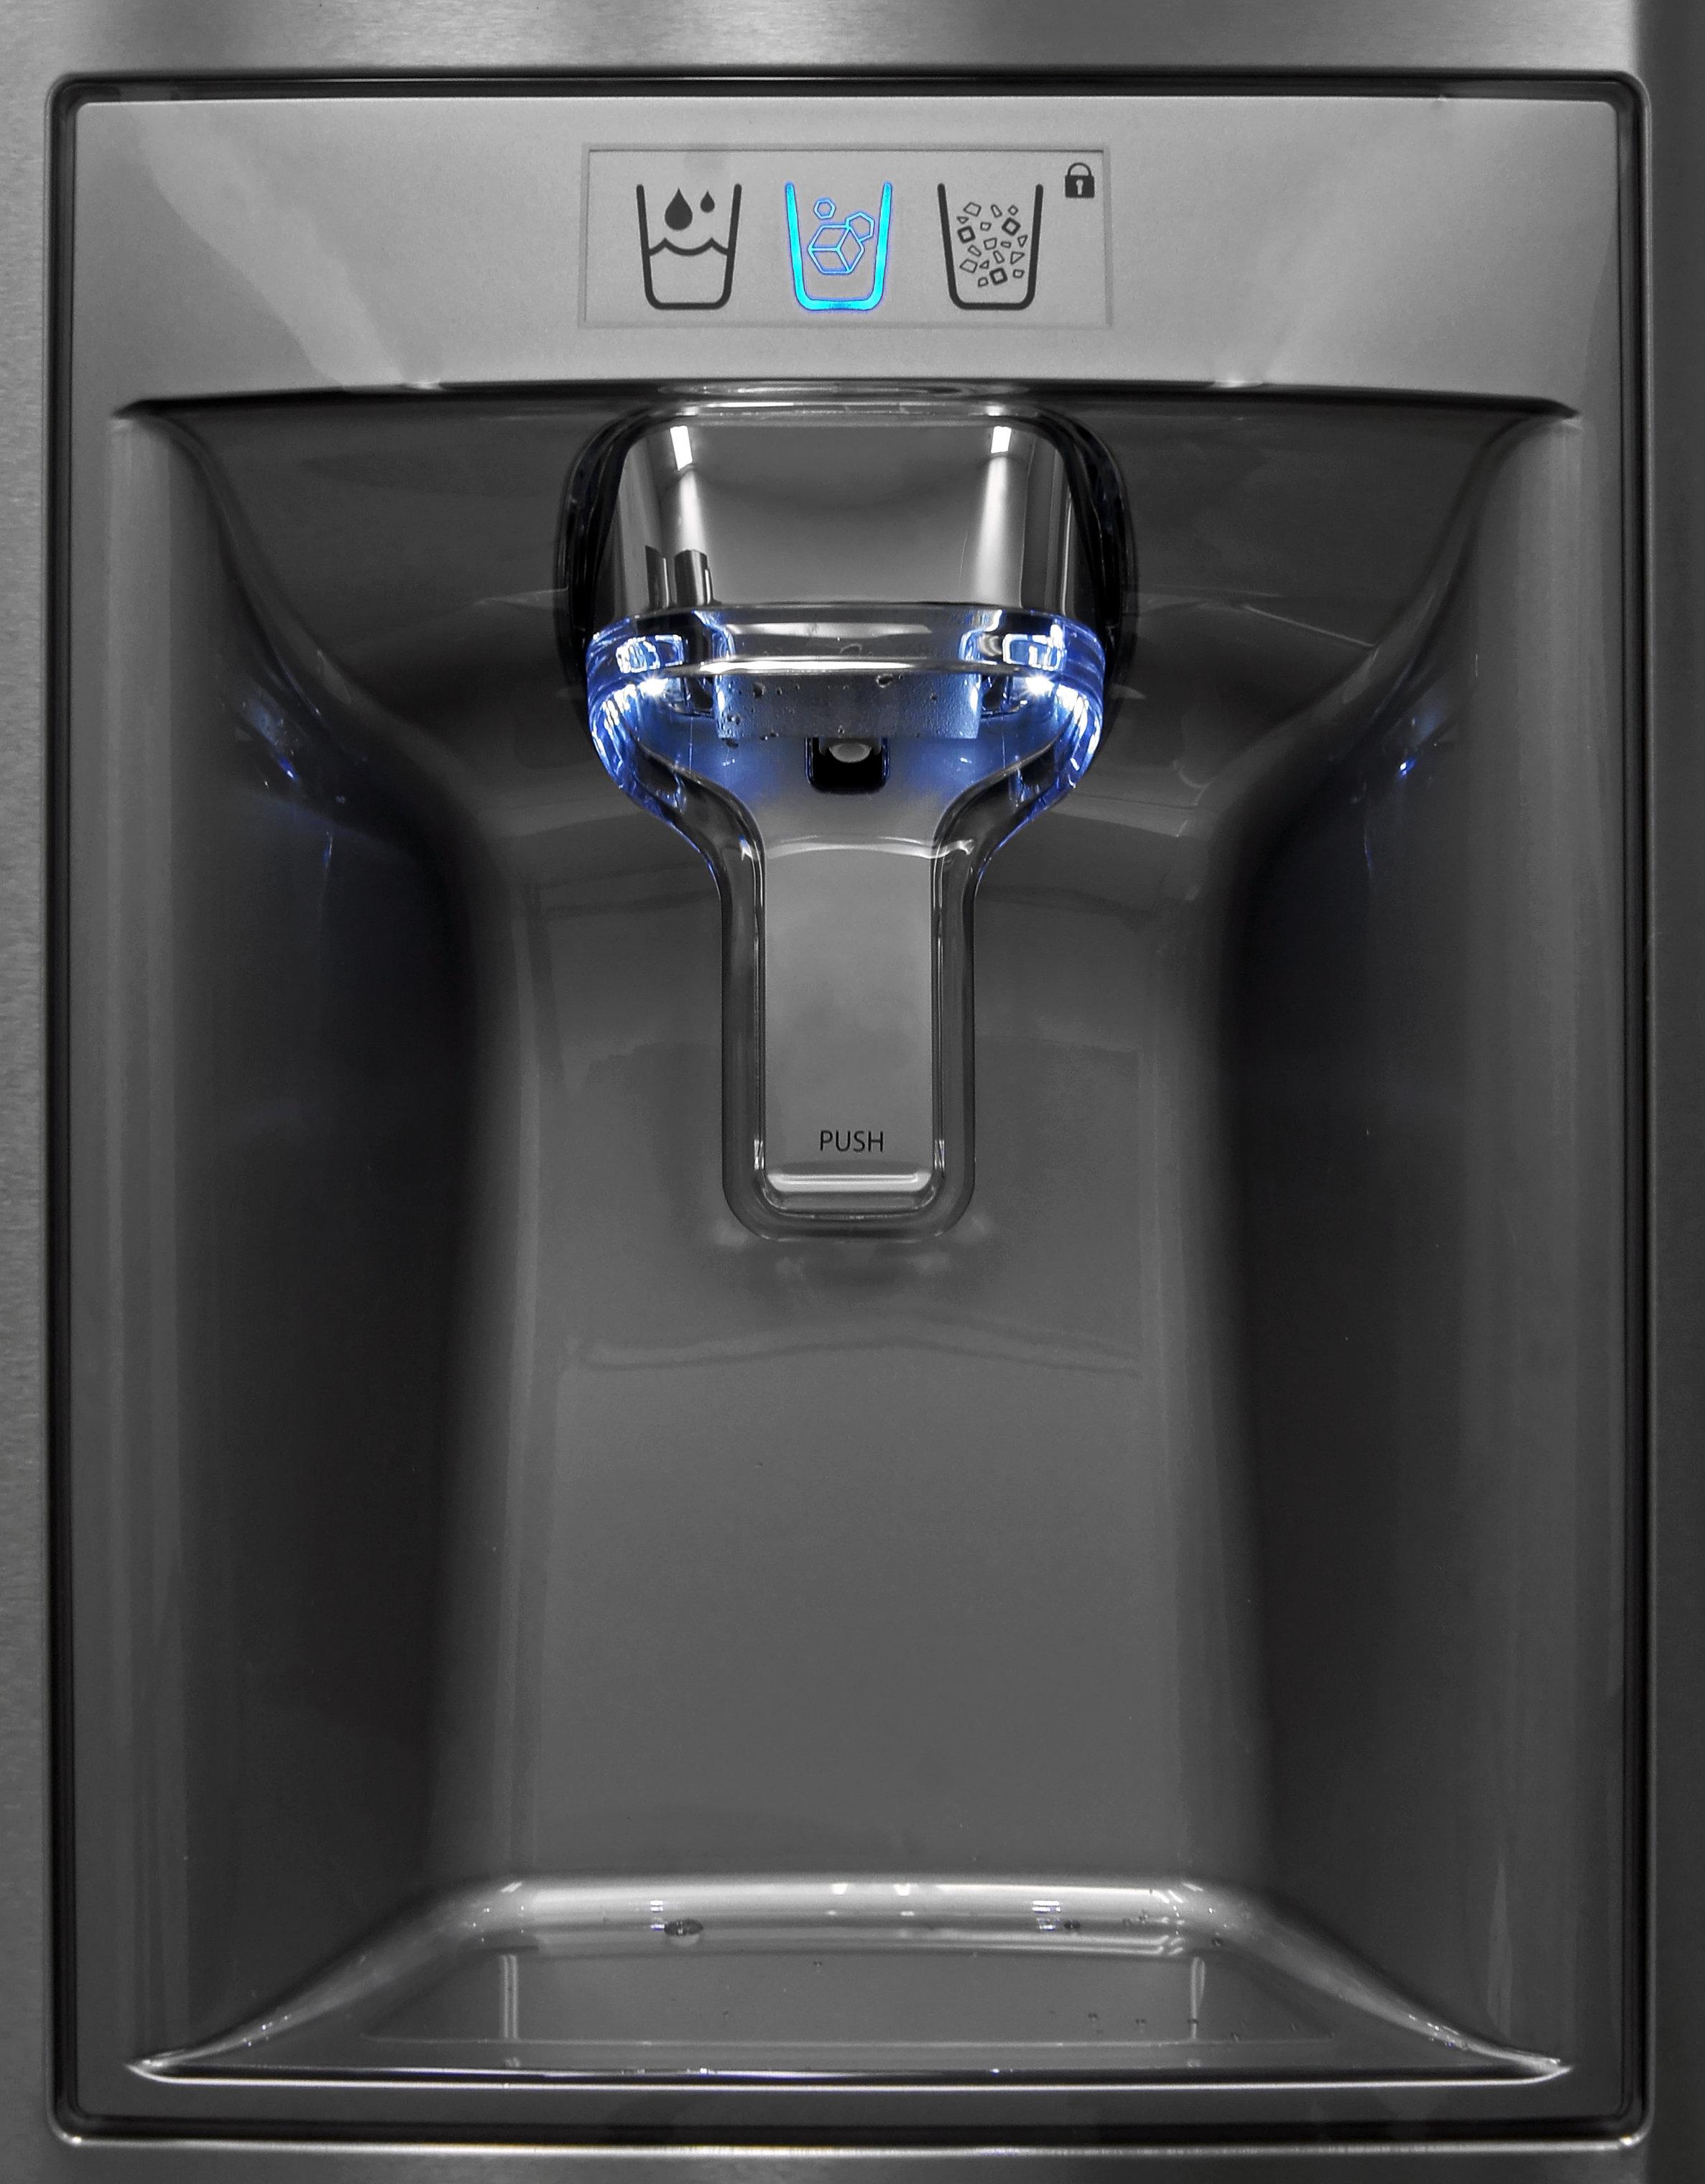 How To Level A Kenmore Refrigerator Kenmore Elite 74033 Refrigerator Review Reviewedcom Refrigerators